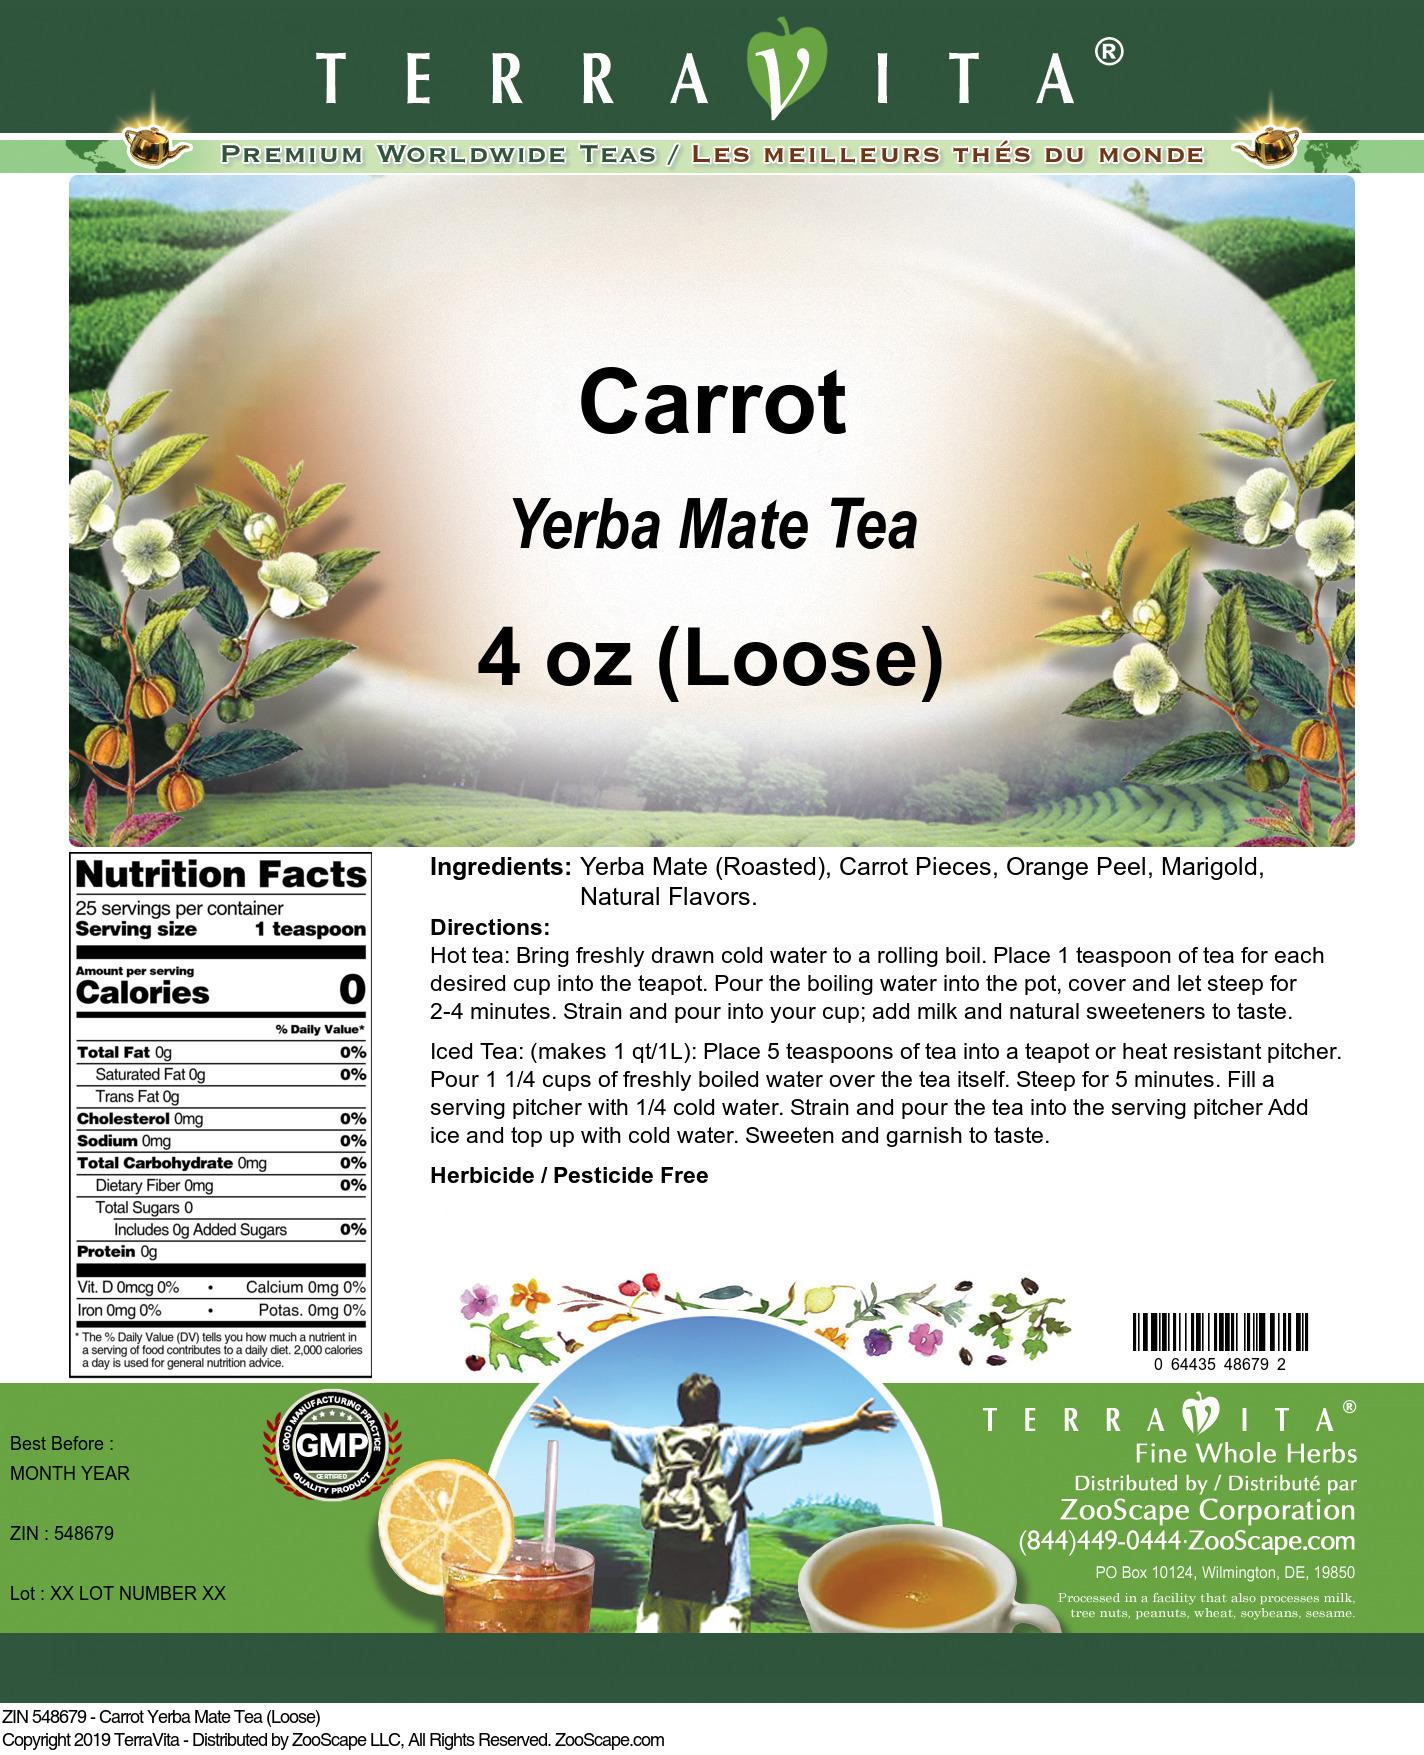 Carrot Yerba Mate Tea (Loose)